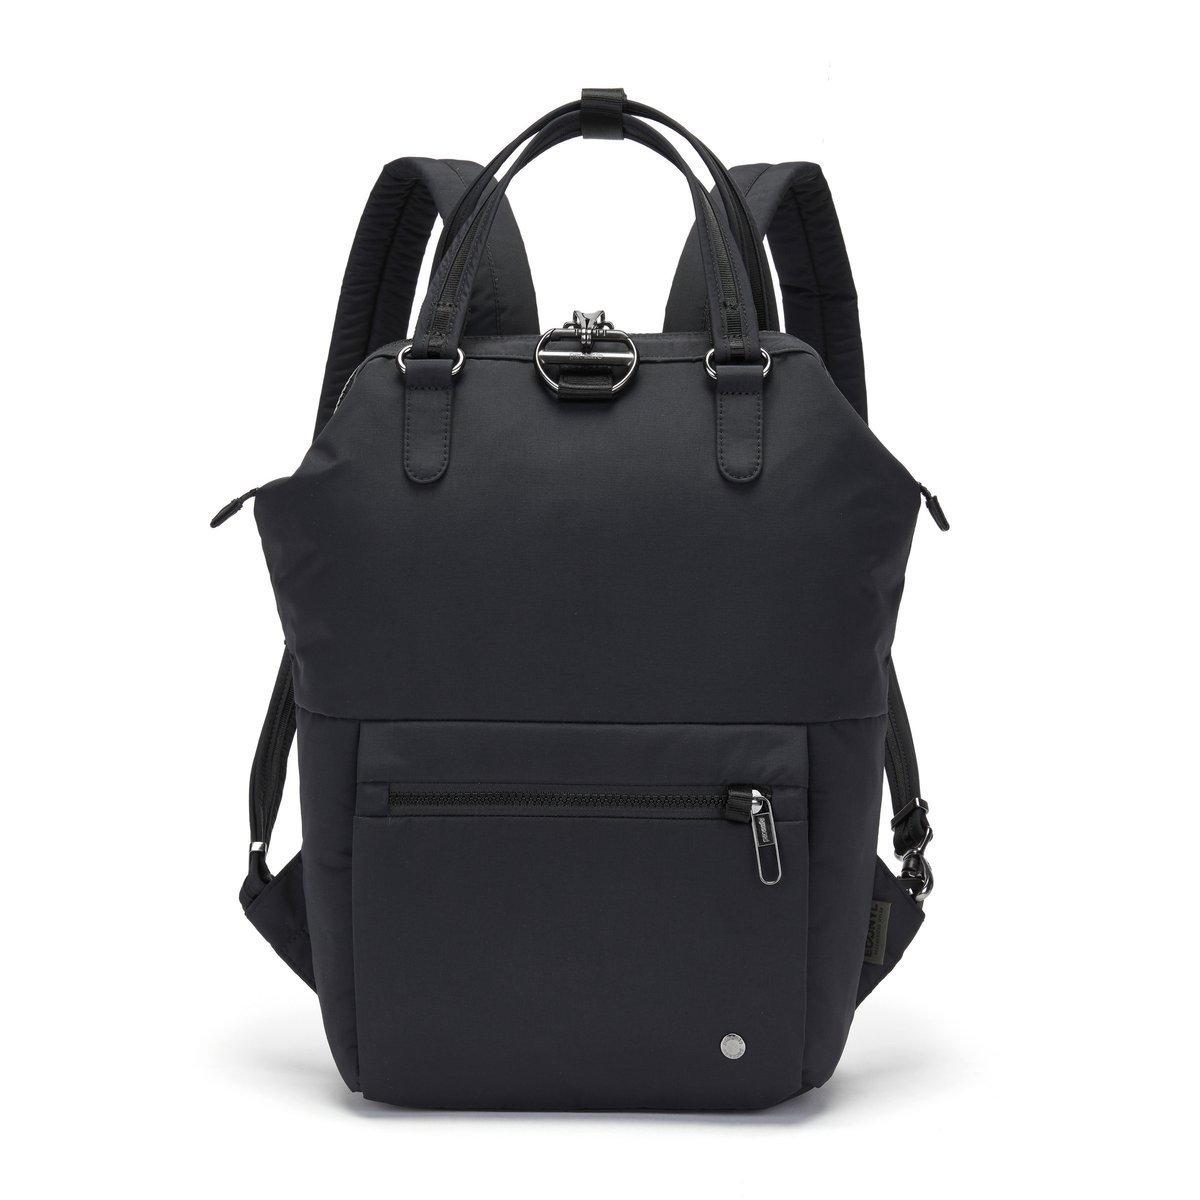 Plecak damski Pacsafe Citysafe CX Econyl Black